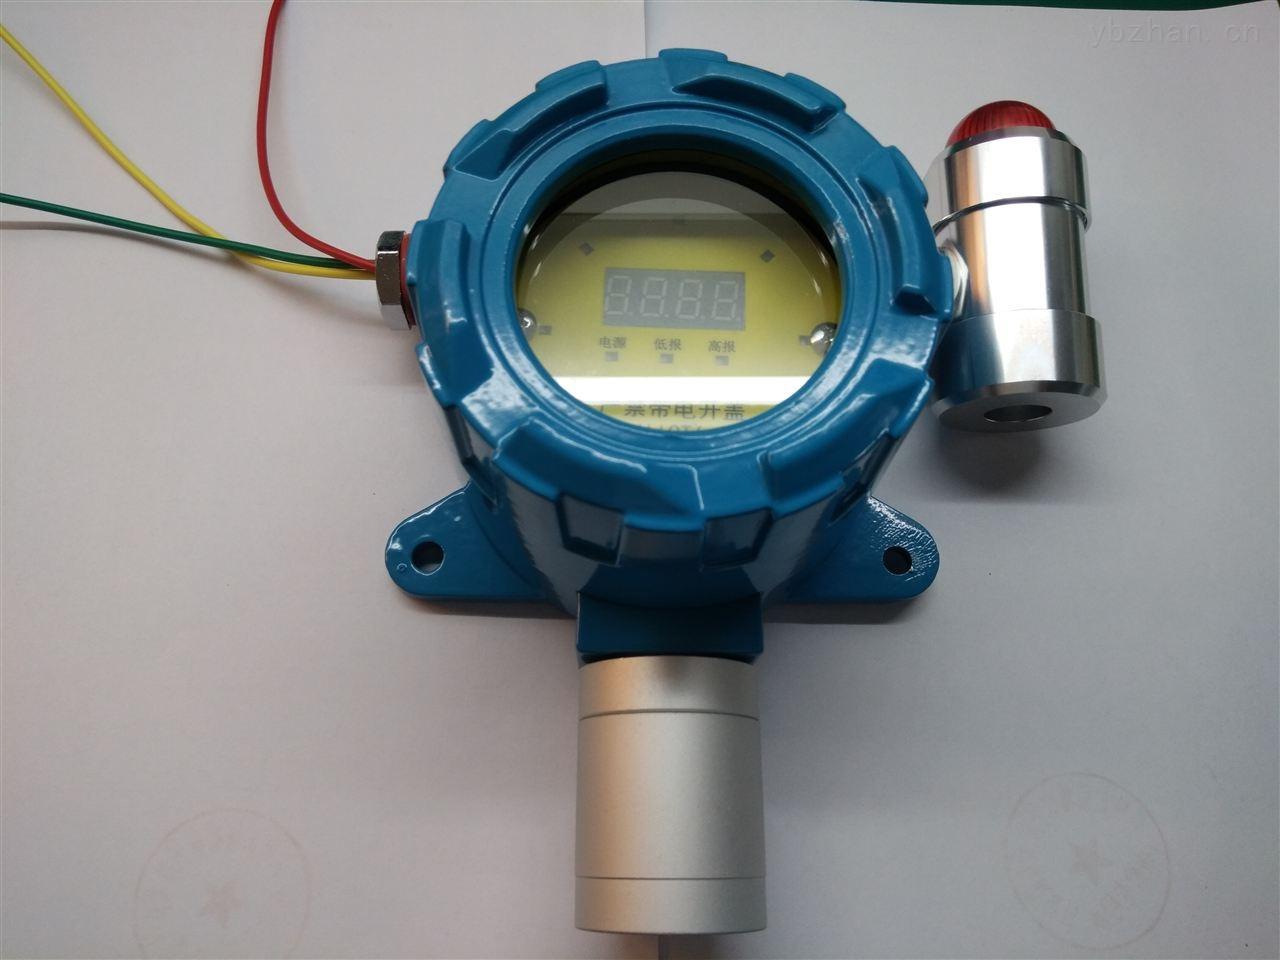 HRP-T1000-氮氧化物检测仪汇瑞埔有毒气体泄漏检测